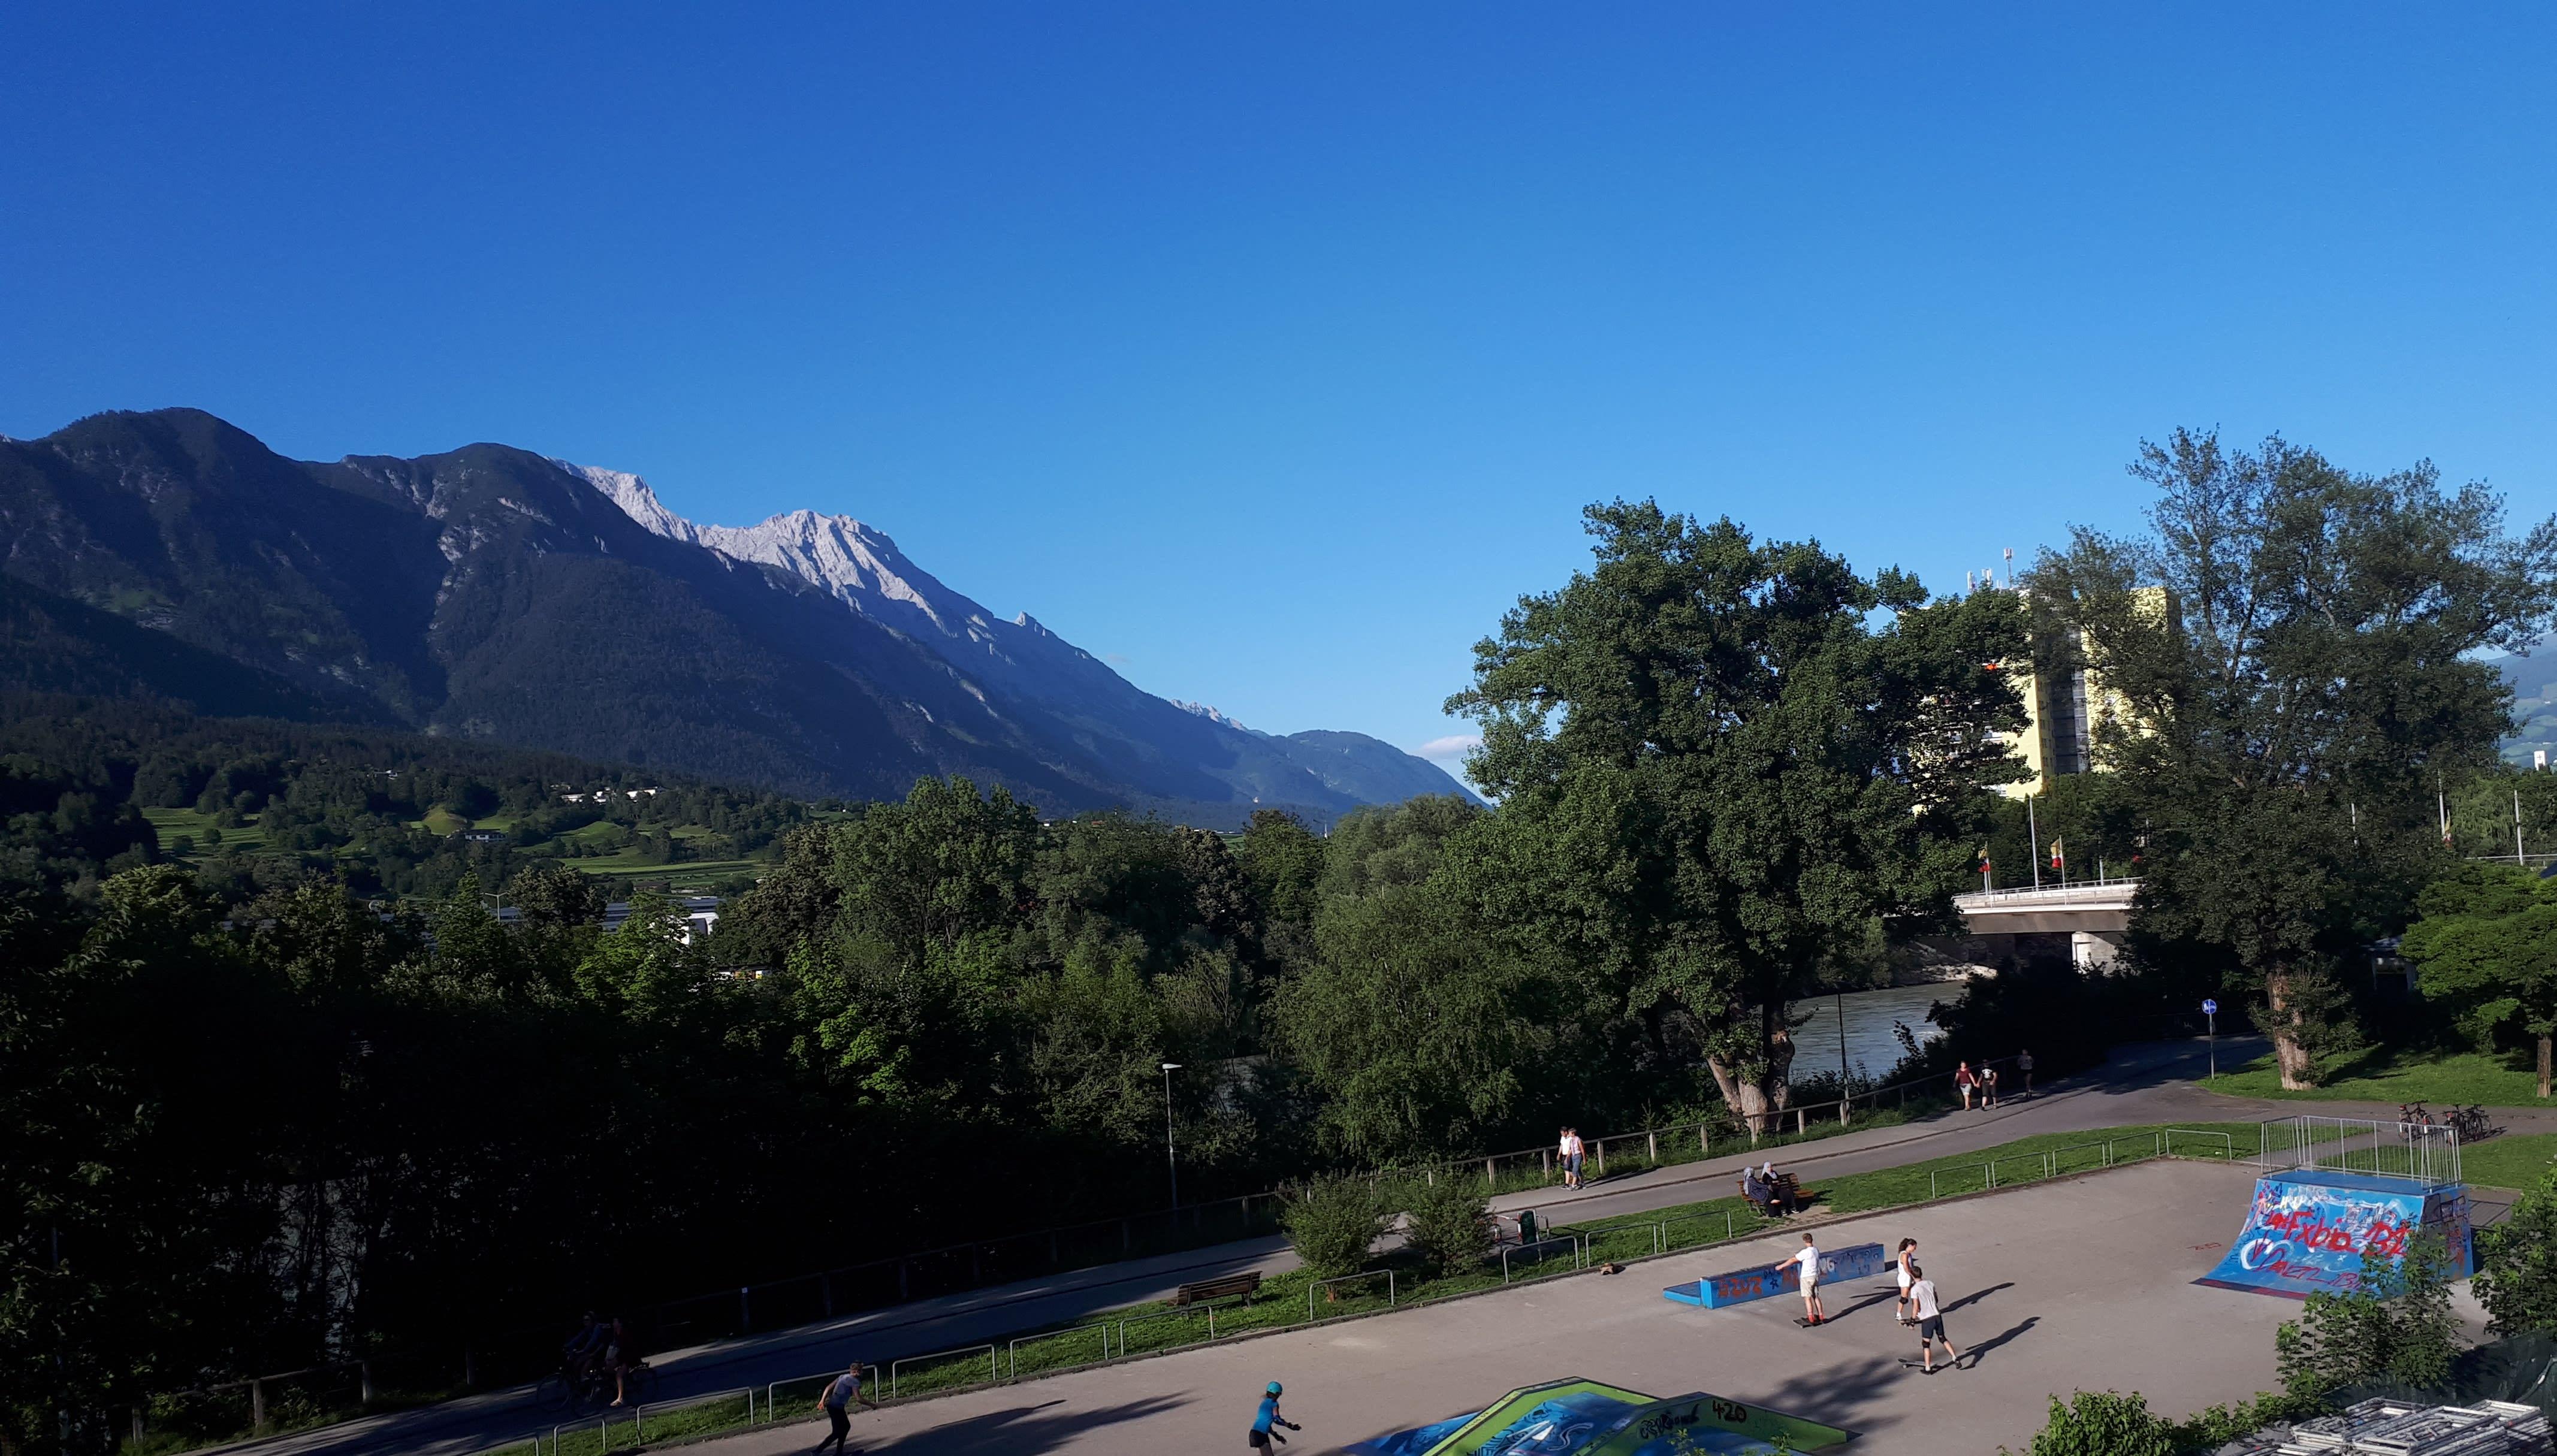 Youth Hostel Innsbruck